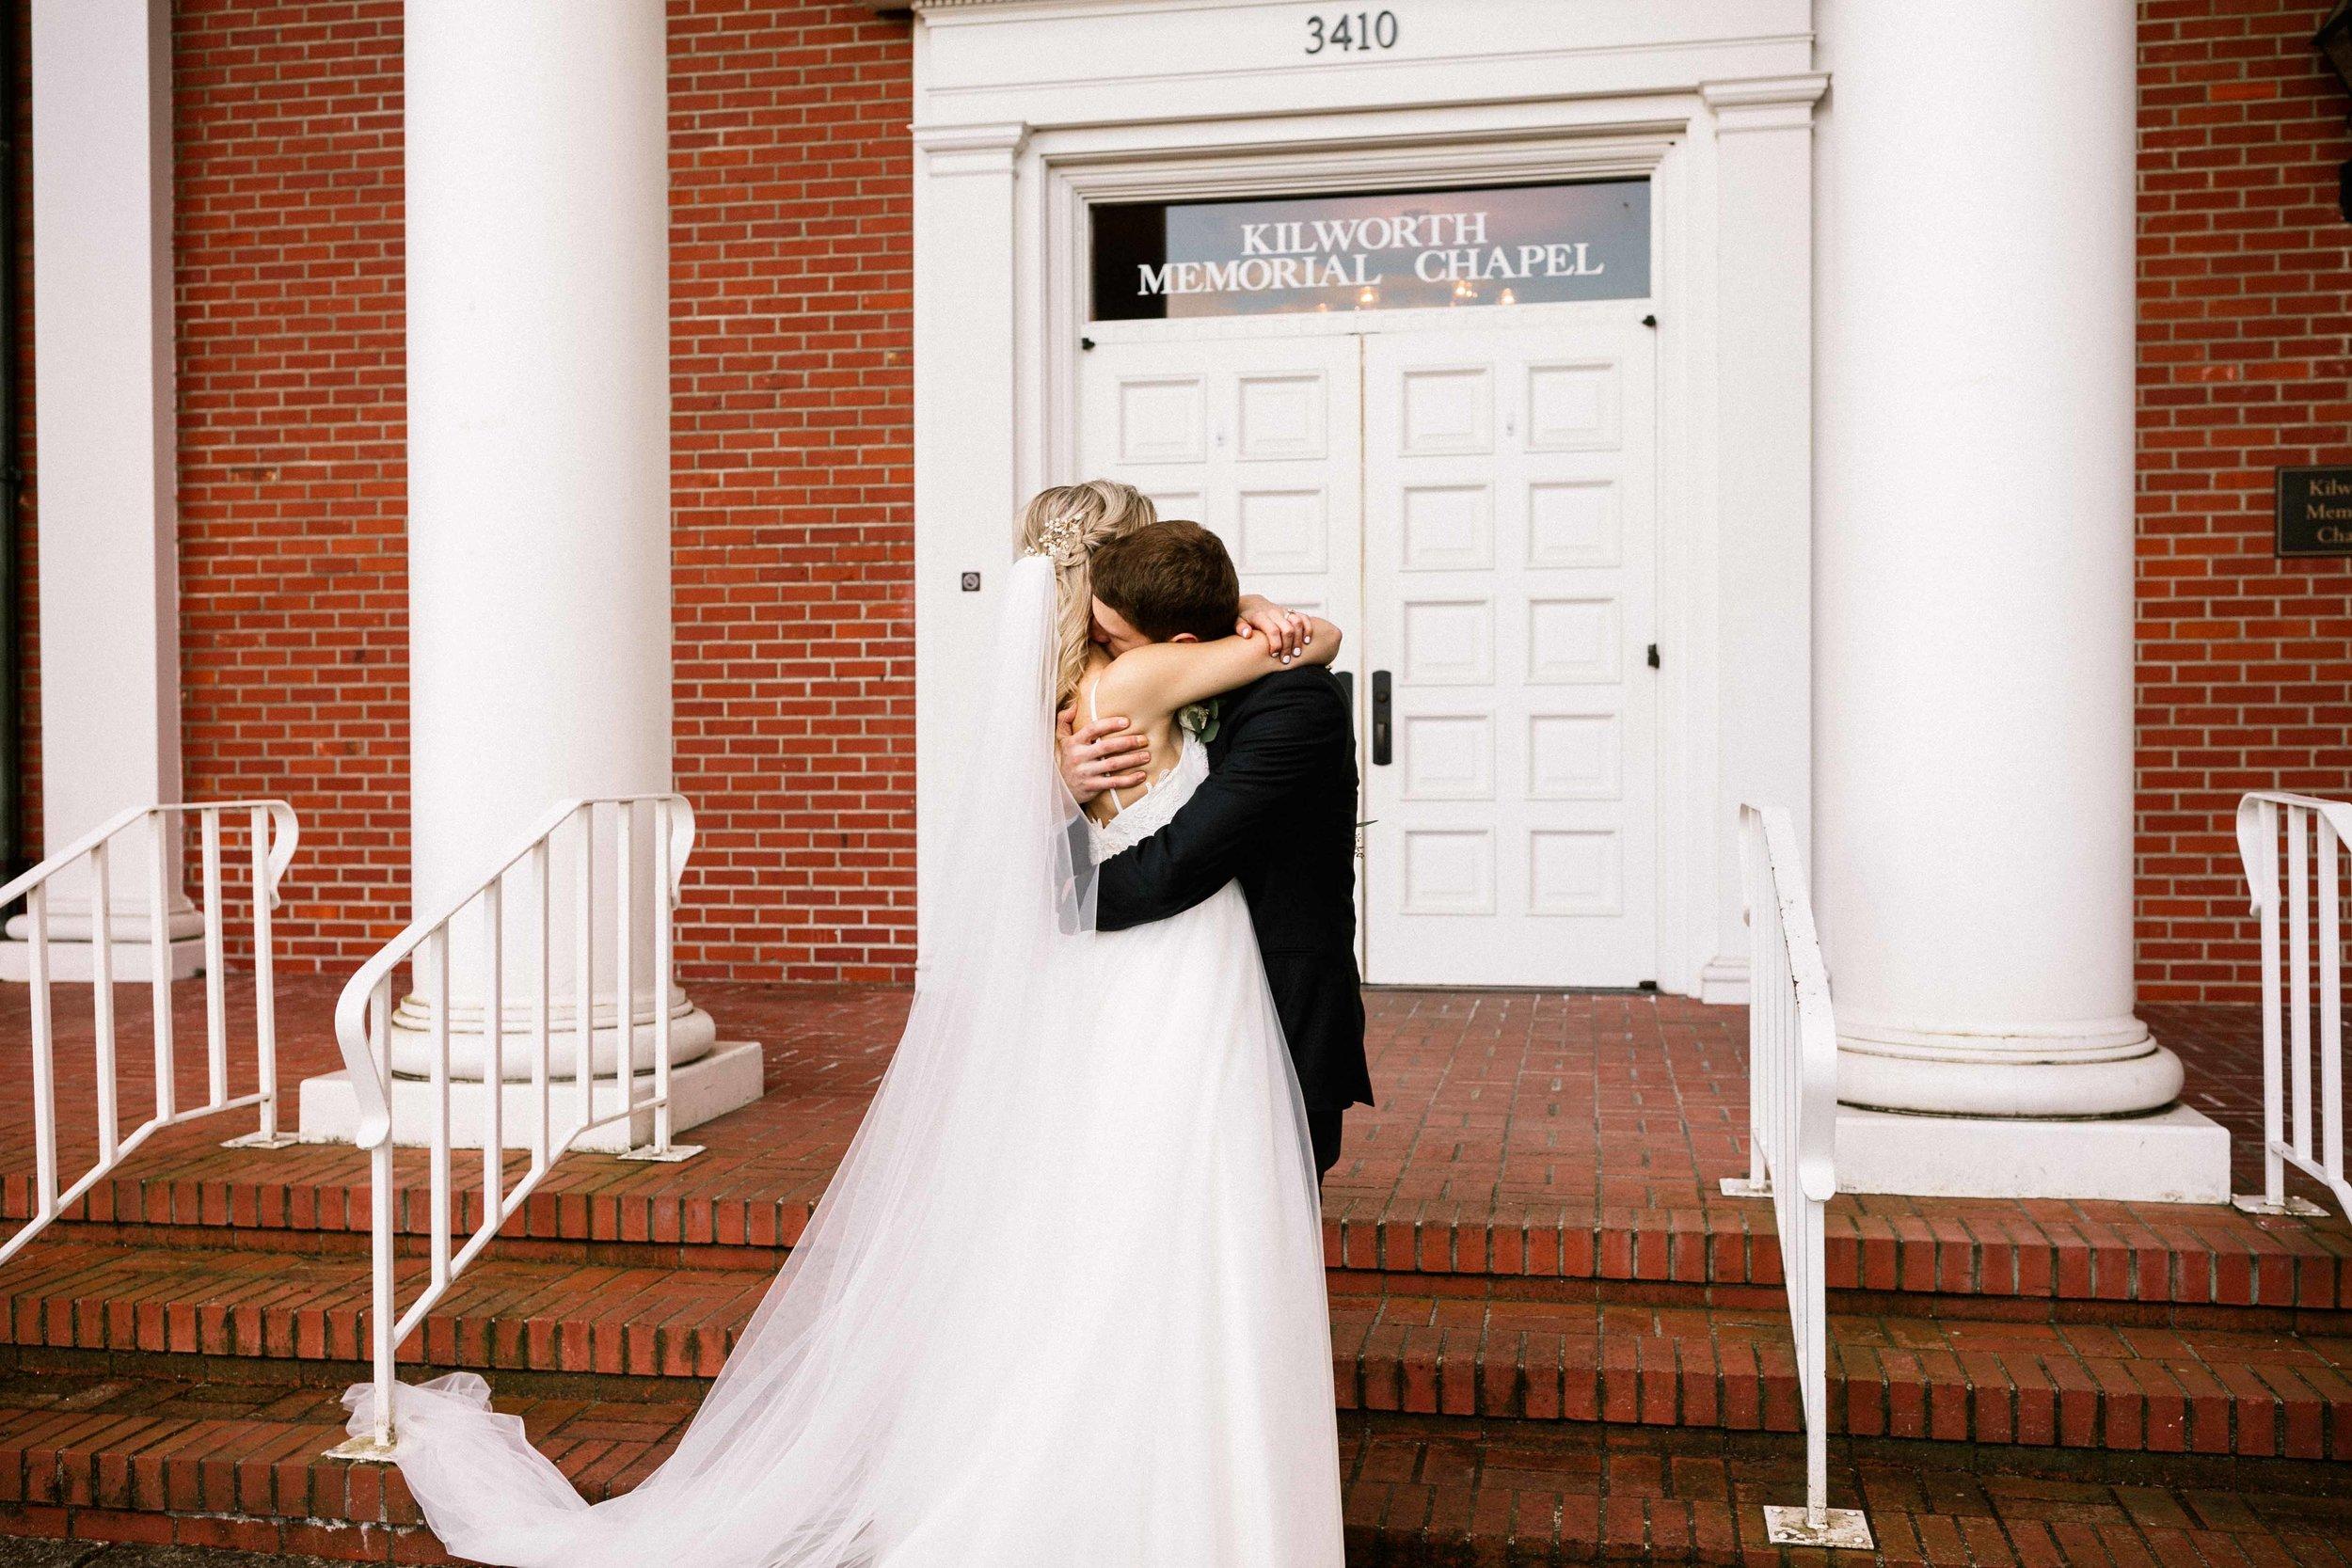 kilworth-memorial-chapel-wedding-91.jpg